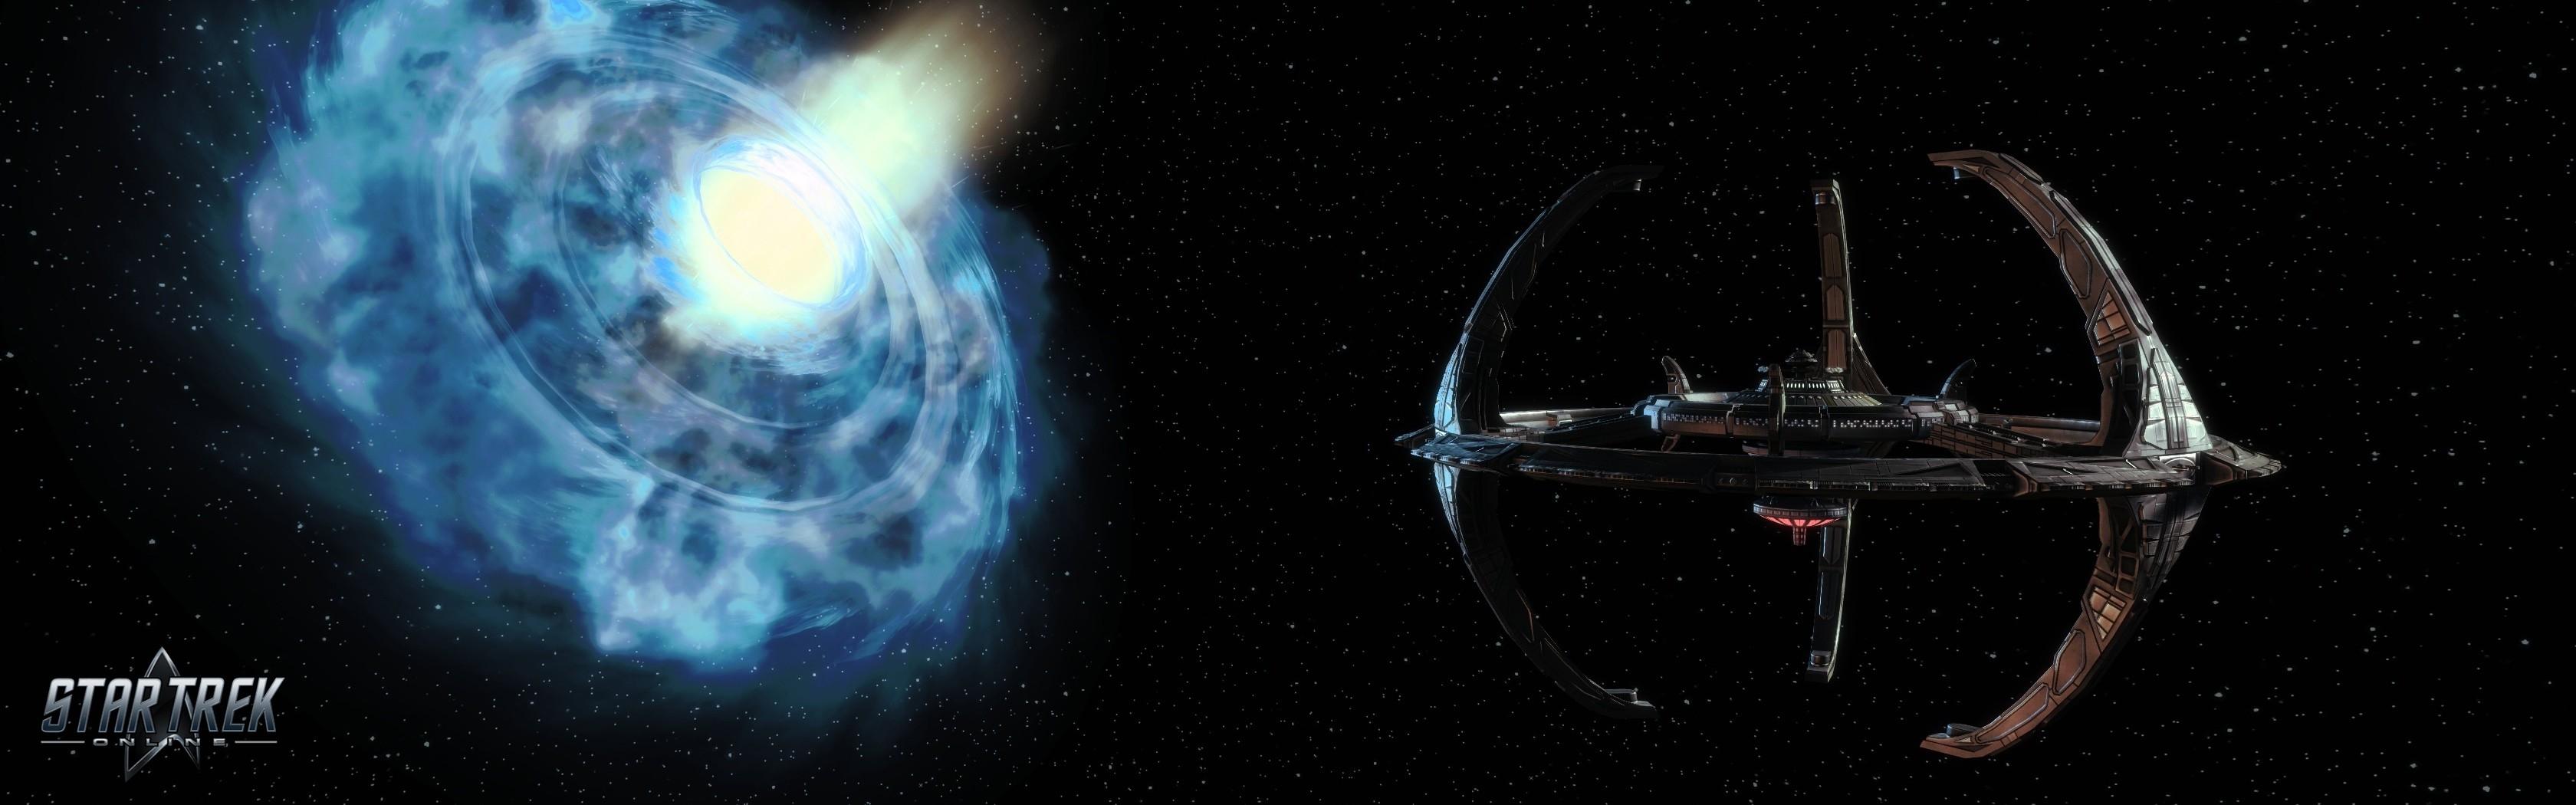 Star trek online science fiction wormhole multiscreen deep space 9 ds9